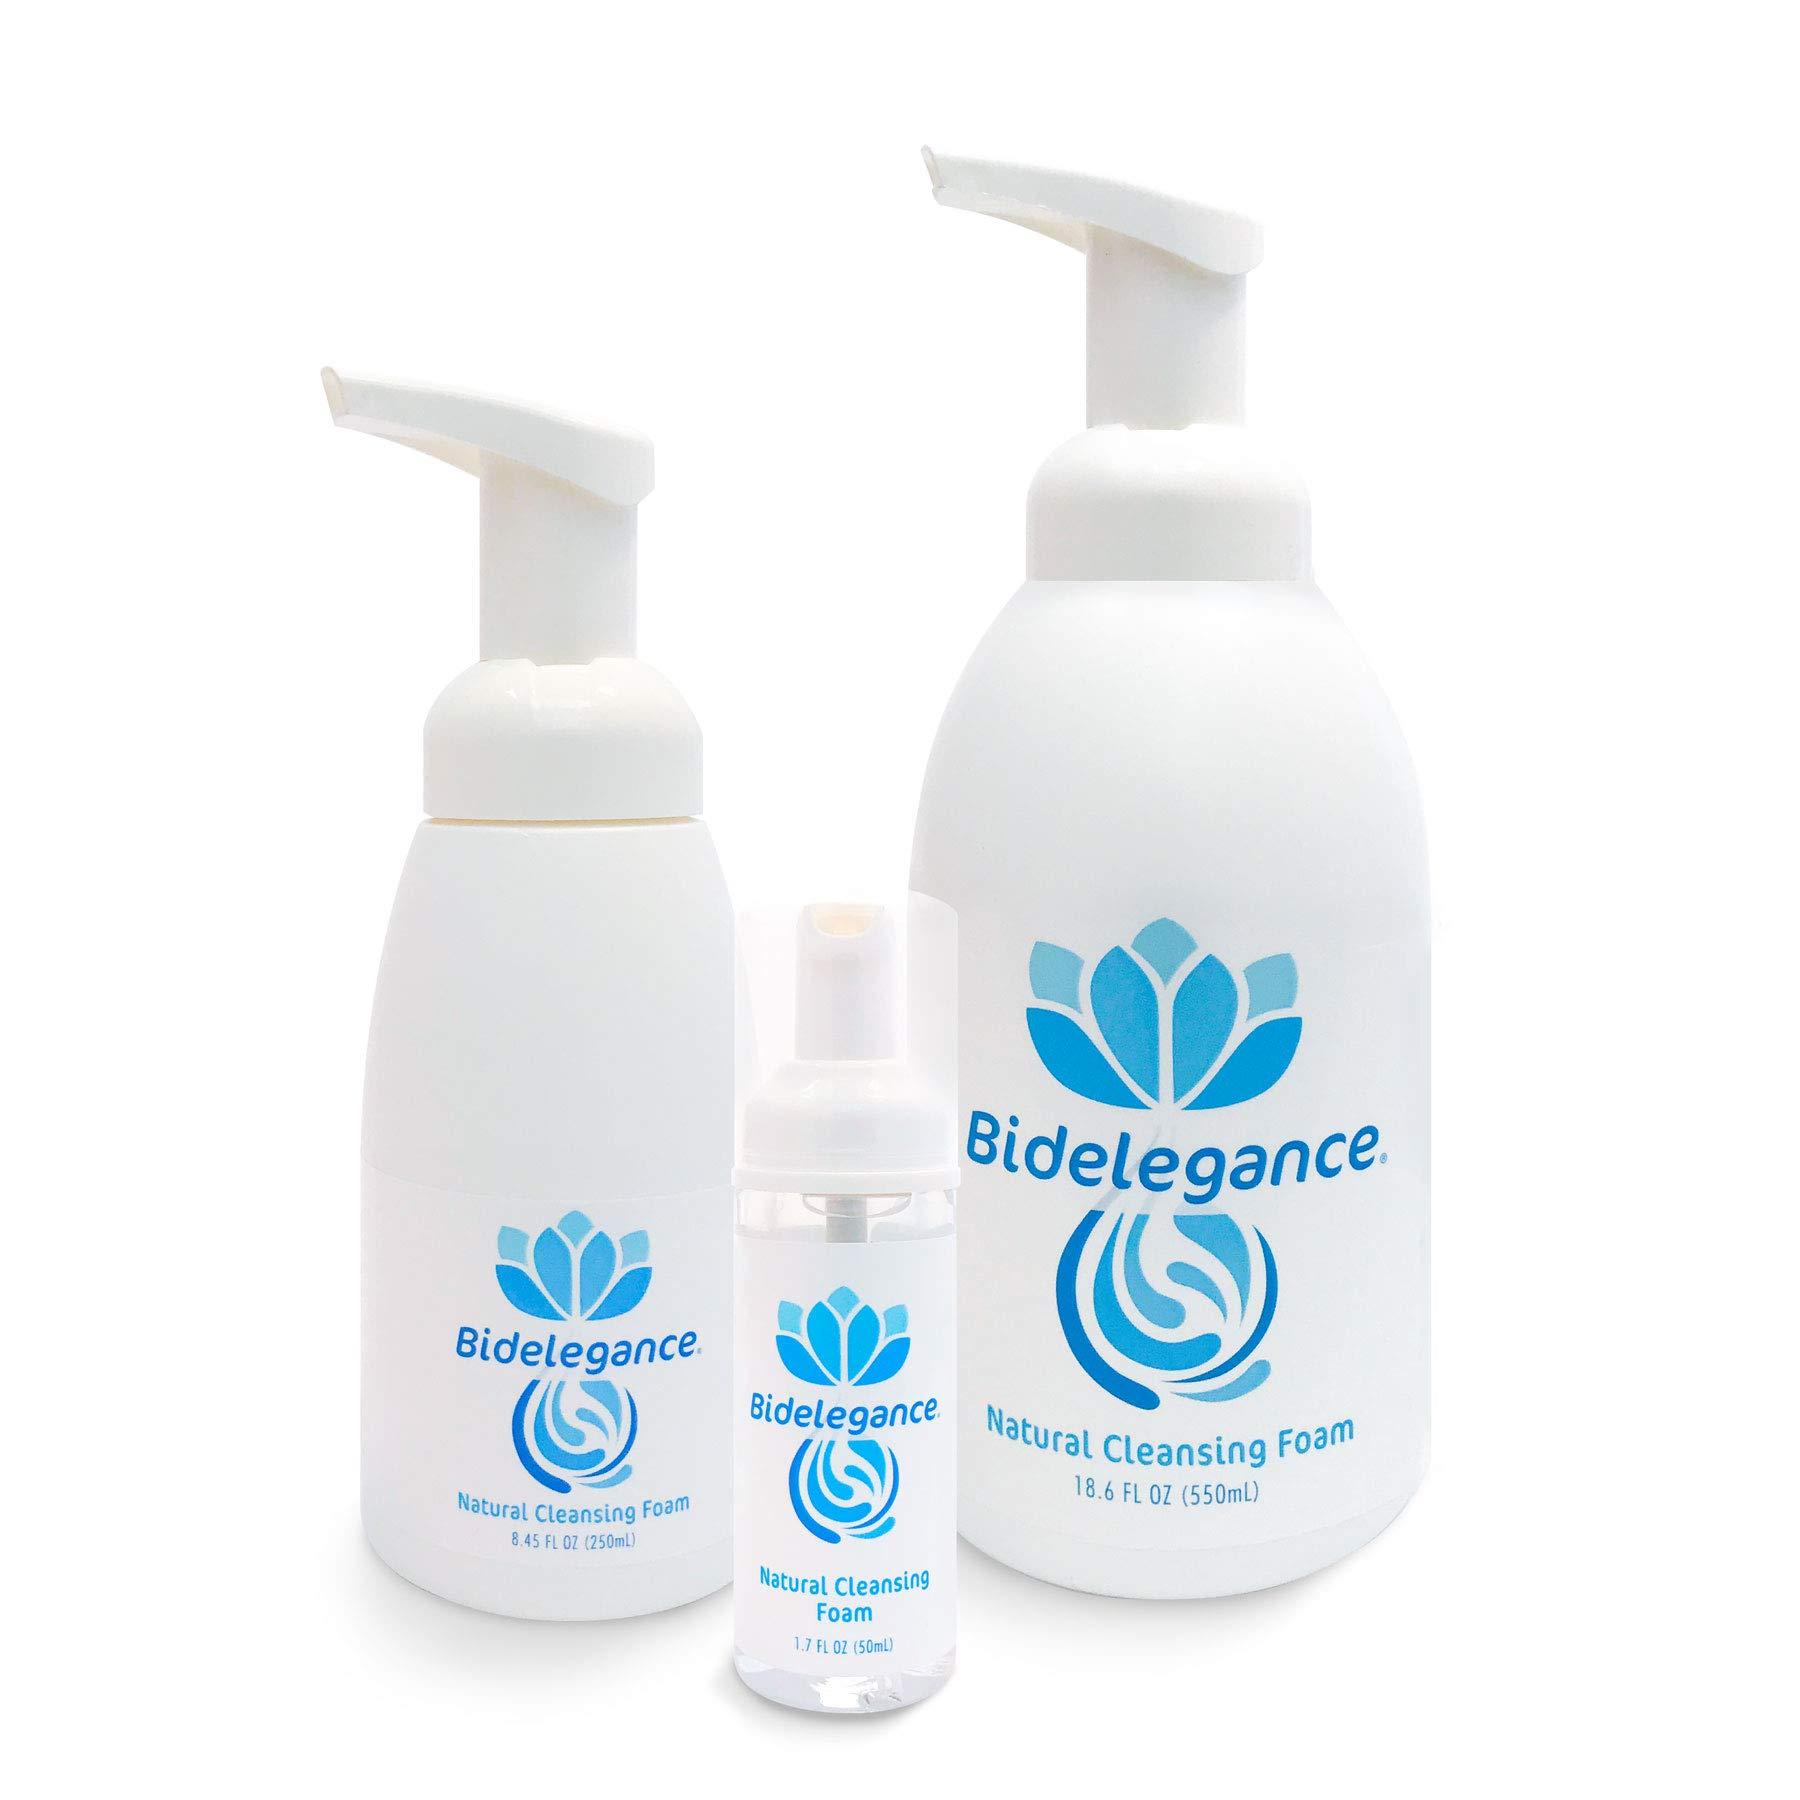 Bidelegance Family Pack by Bidelegance